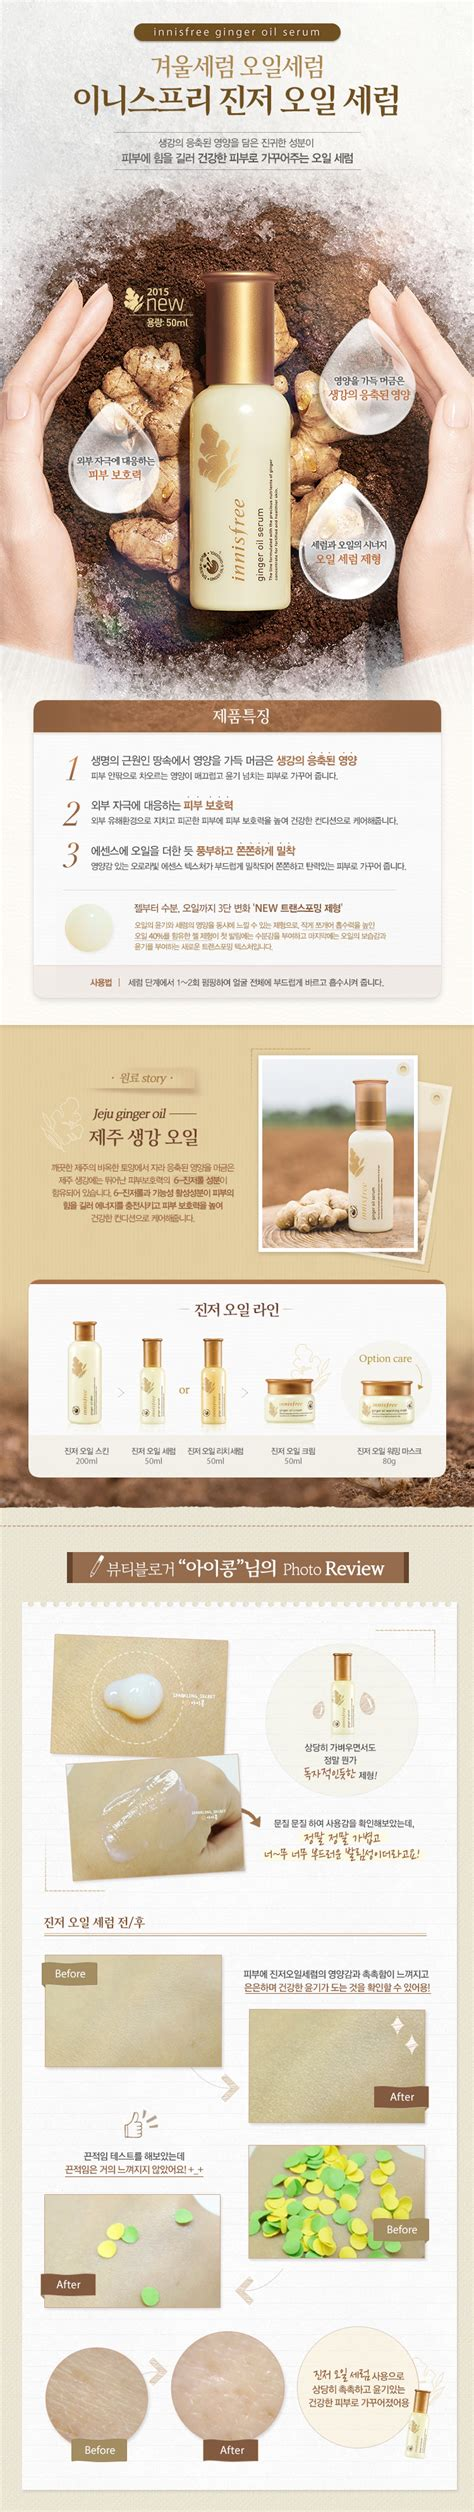 The Shop Jeju Volcanic Lave Pore Toner innisfree serum 50ml kbeauty original